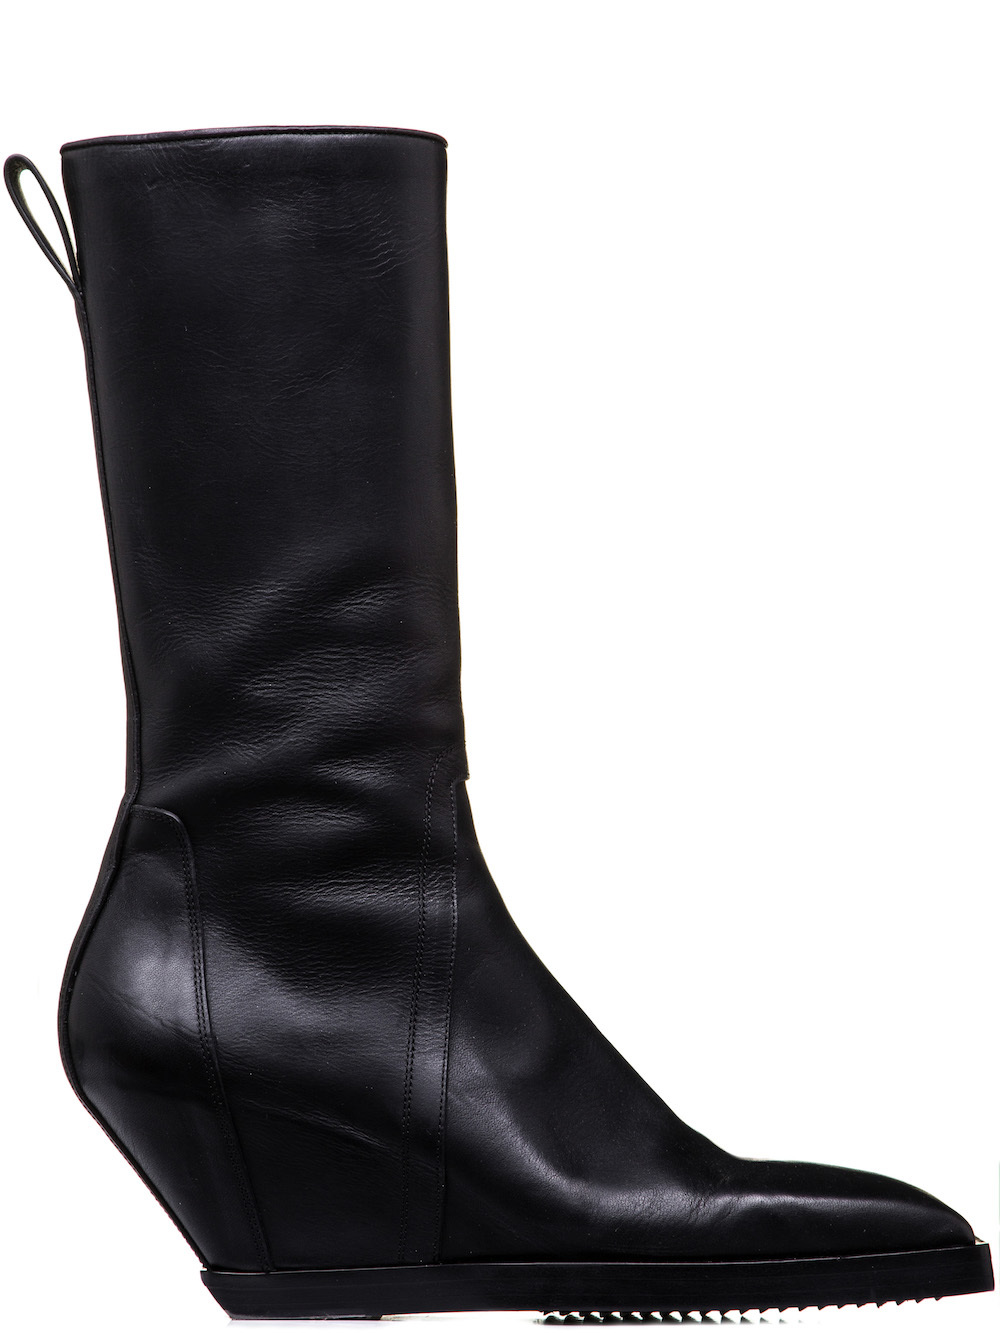 Rick Owens Black Square Toe Boots cheap sale shop offer yeKz32